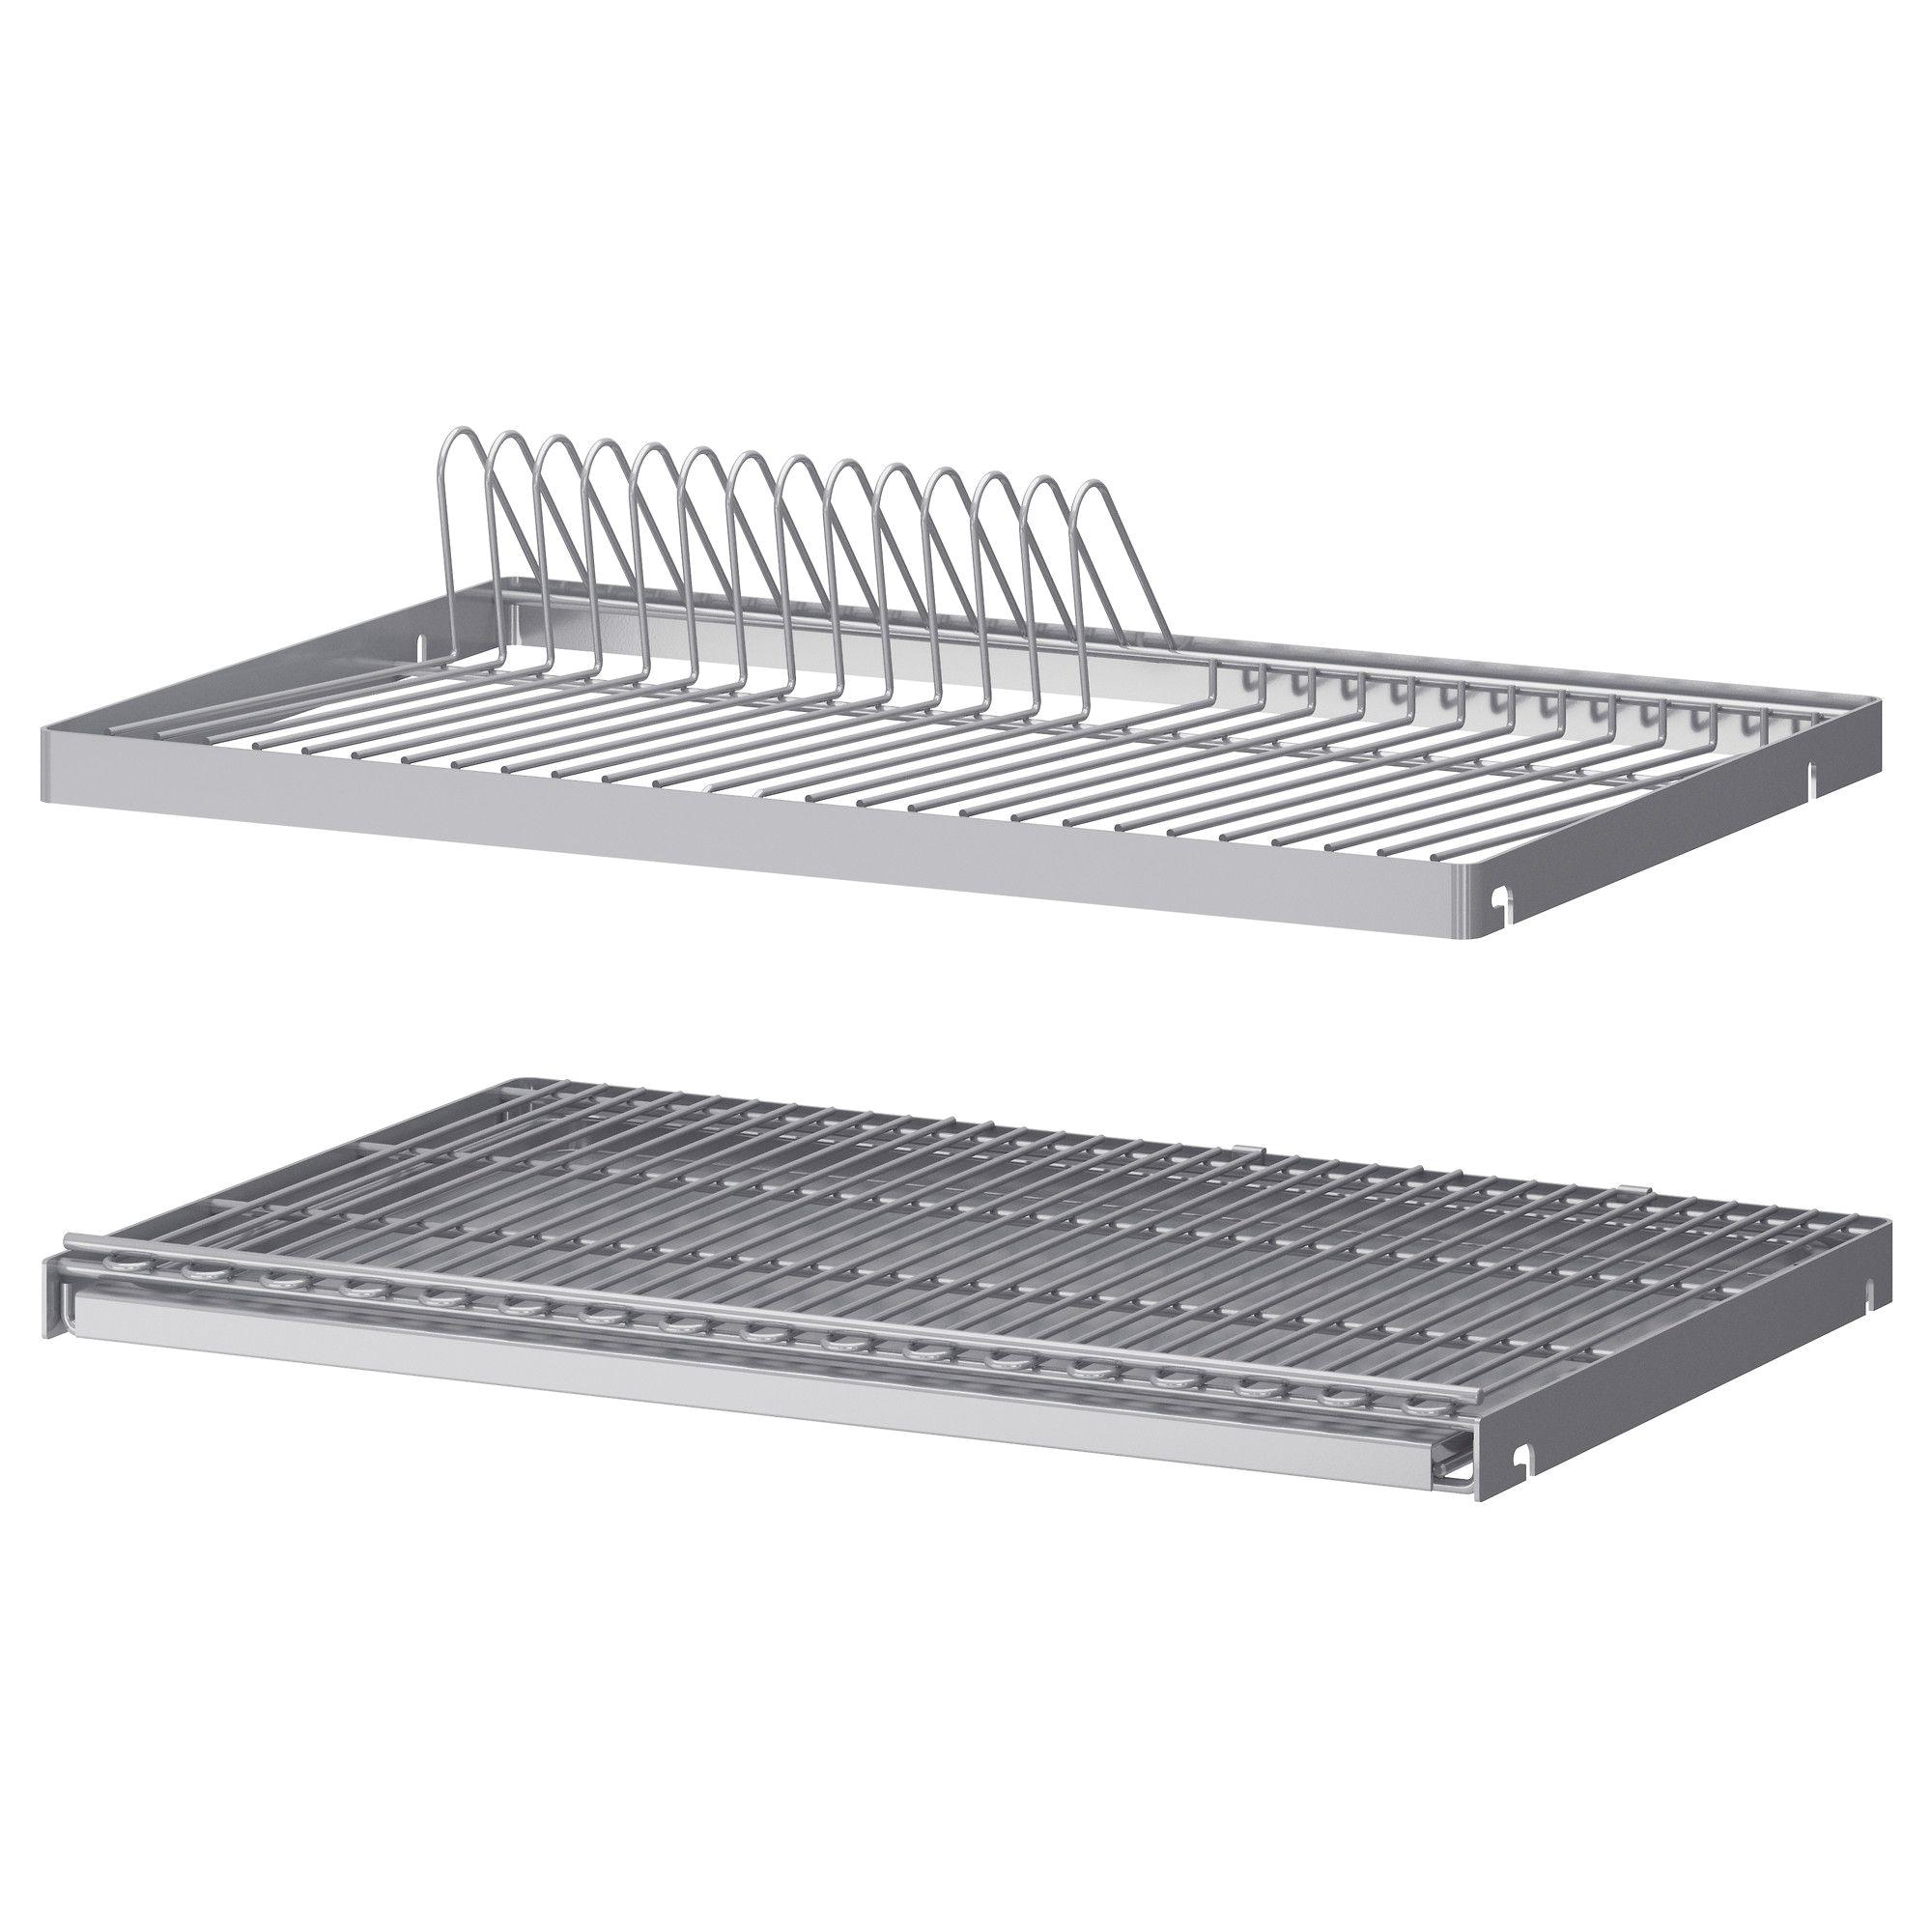 utrusta drainer for wall cabinet 60x35 cm ikea italy tiskikaappi finnish dish drying rack